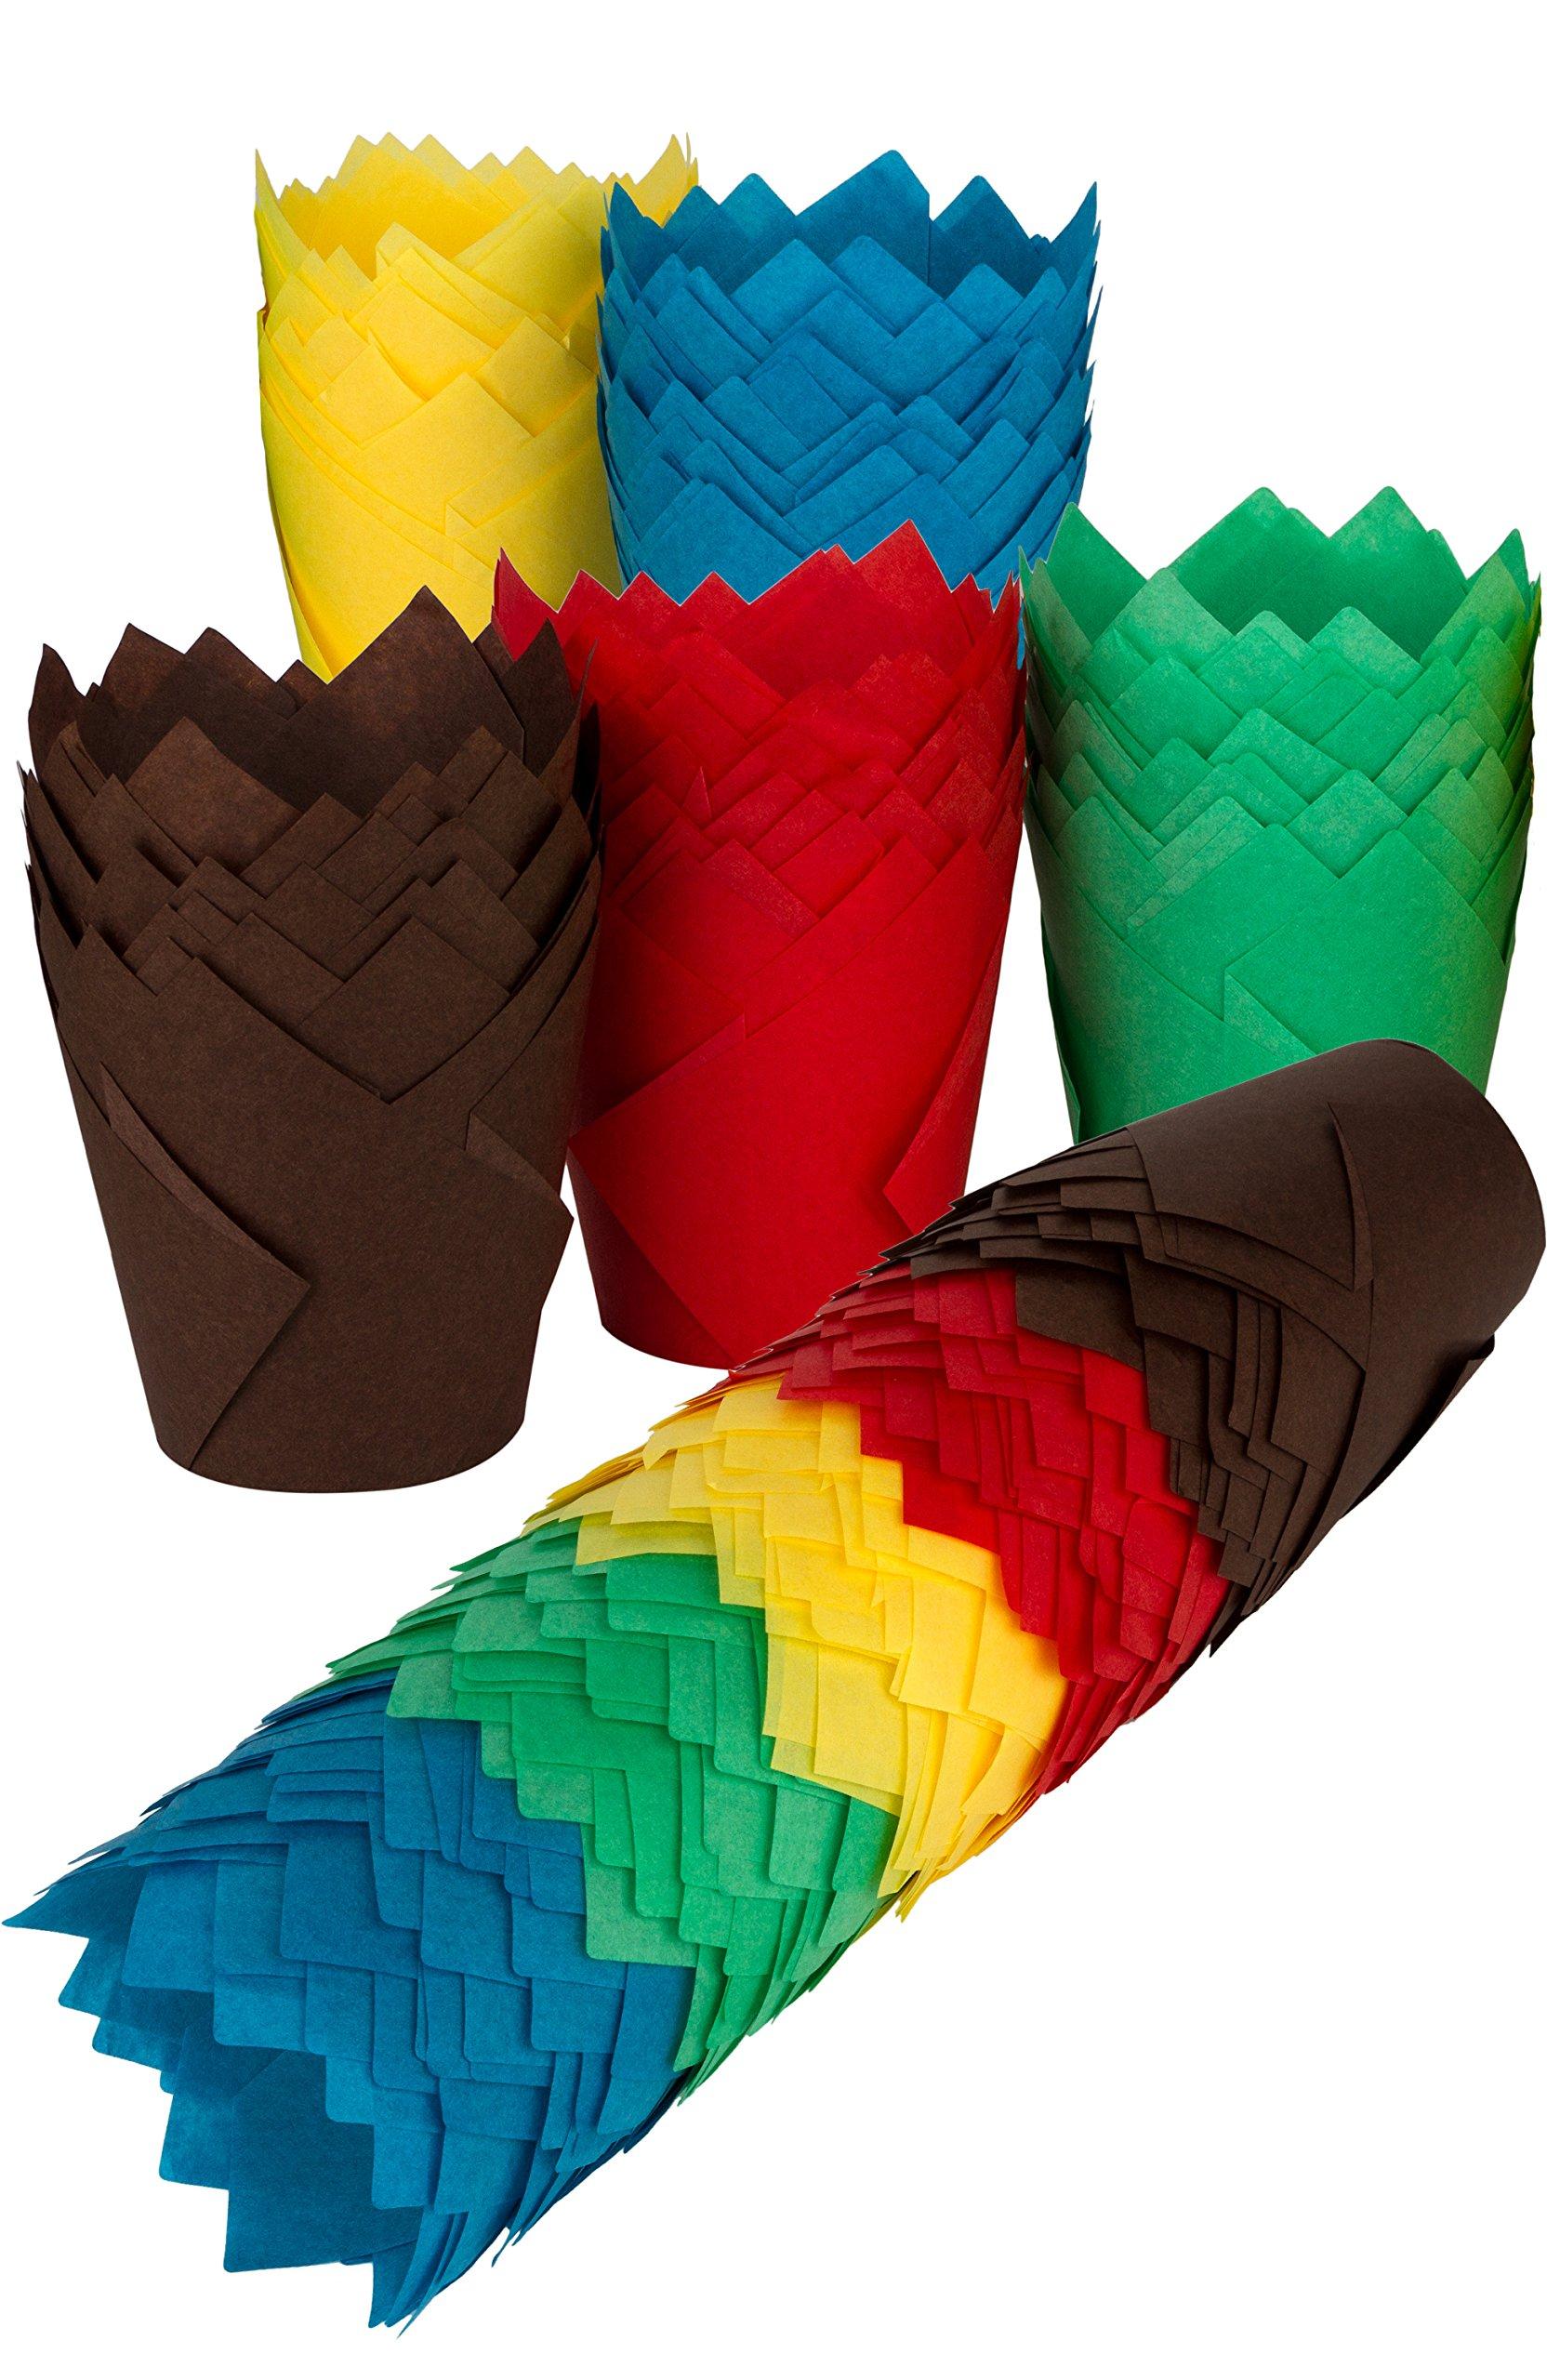 Tulip Cupcake Liners, 150 Multi Paper Baking Cups, Standard or Jumbo Muffin Pan by PETANI (3 x 2 in, Multi)